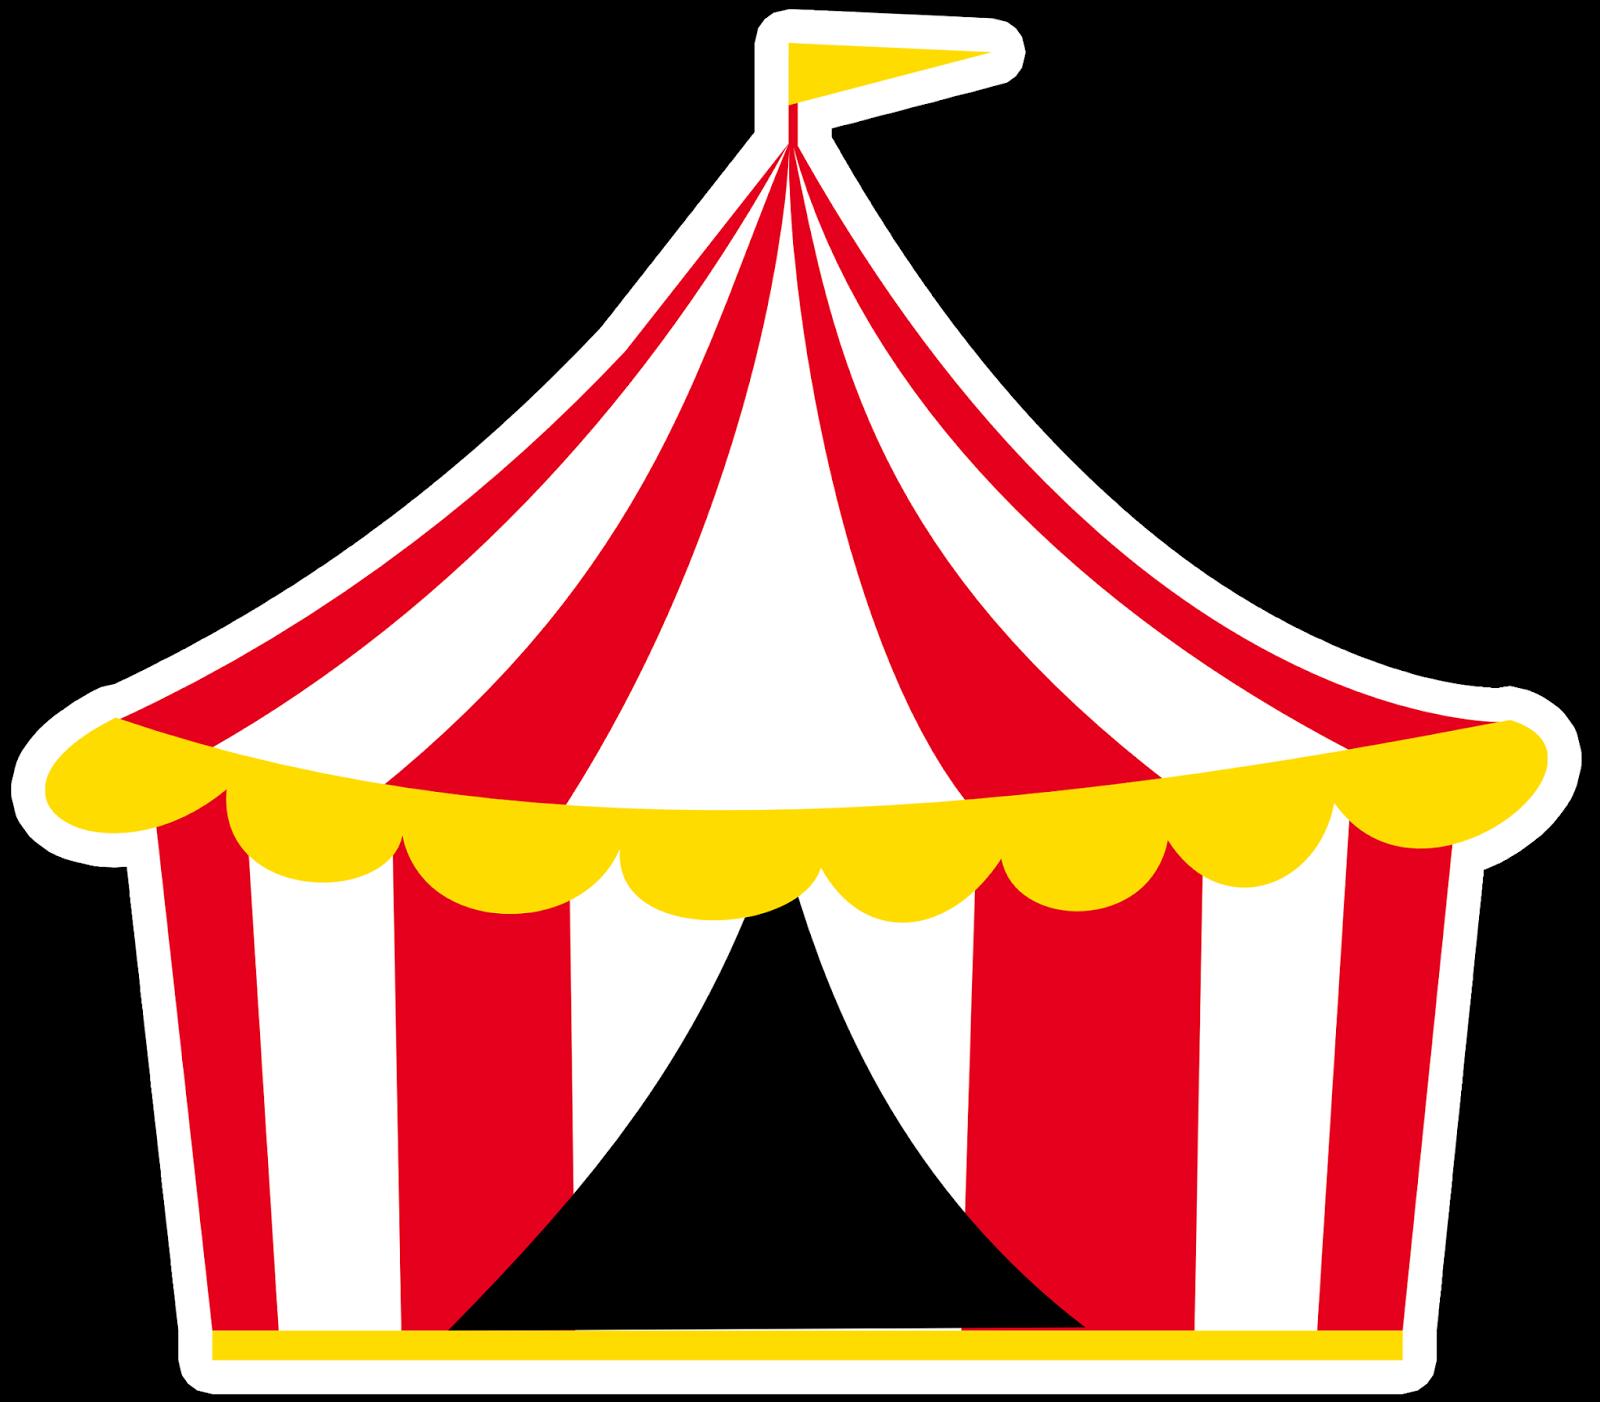 Number 1 clipart circus. Vetor circo macaco le